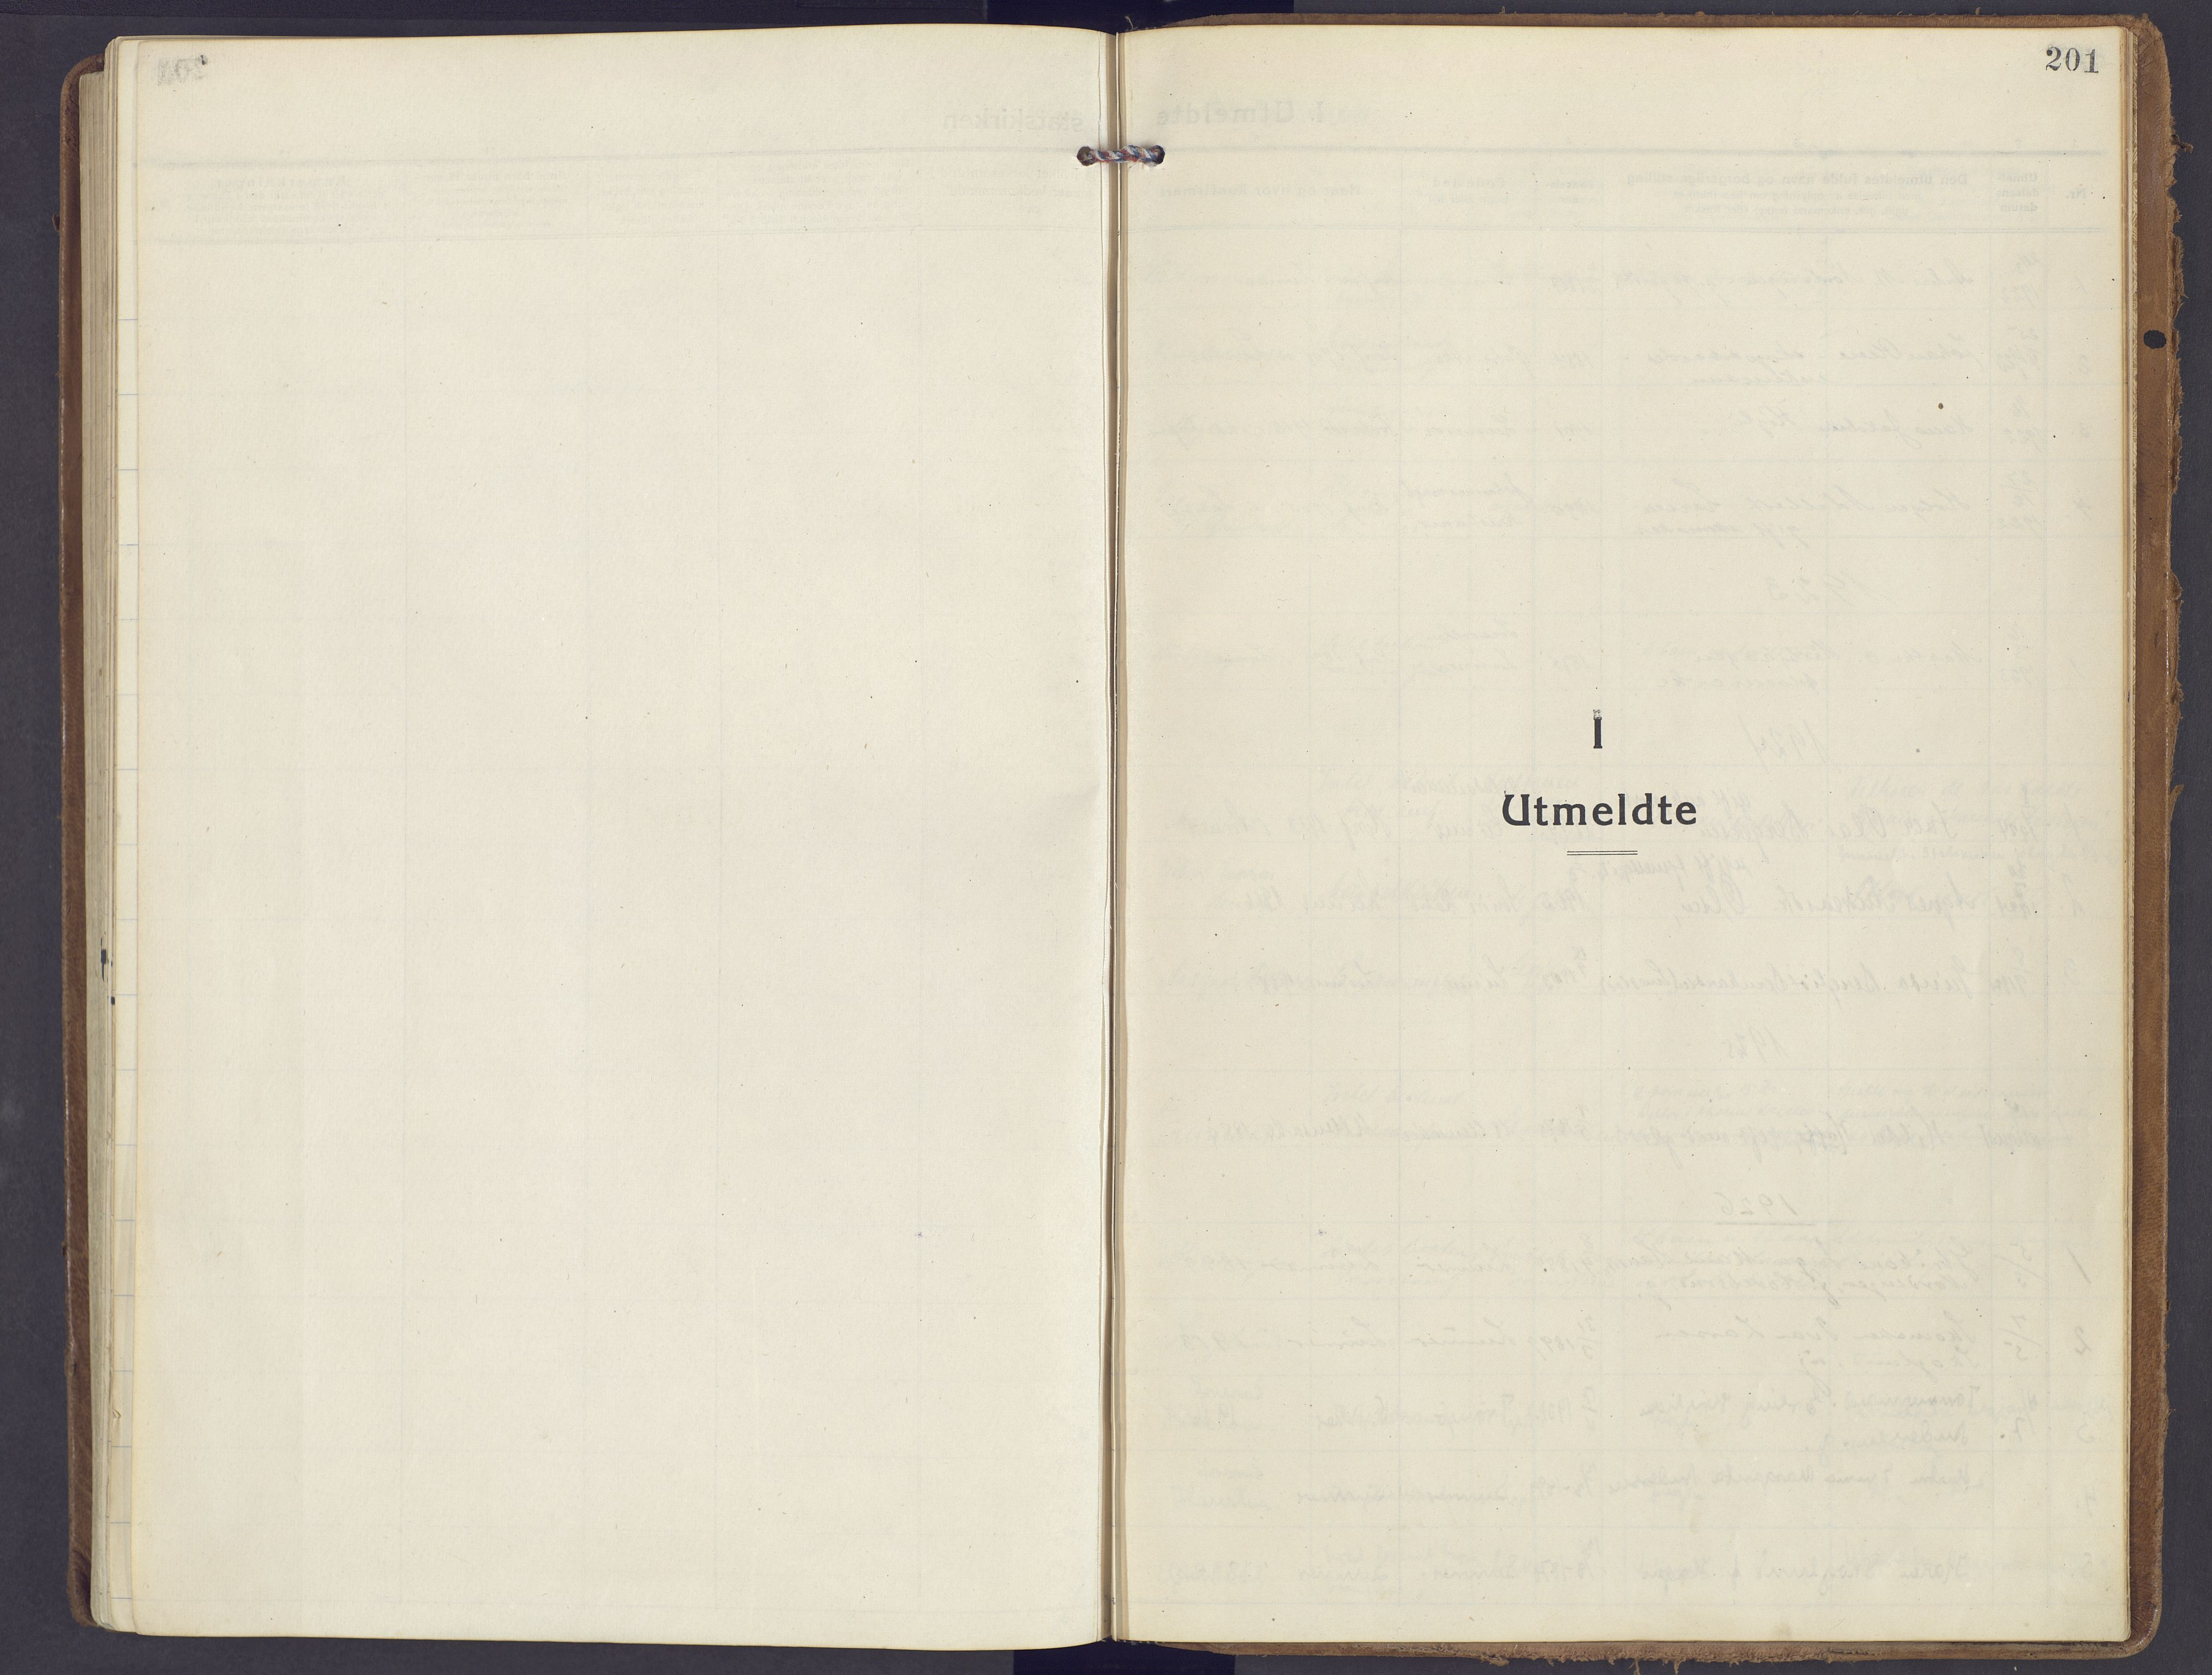 SAH, Lunner prestekontor, H/Ha/Haa/L0002: Ministerialbok nr. 2, 1922-1931, s. 201